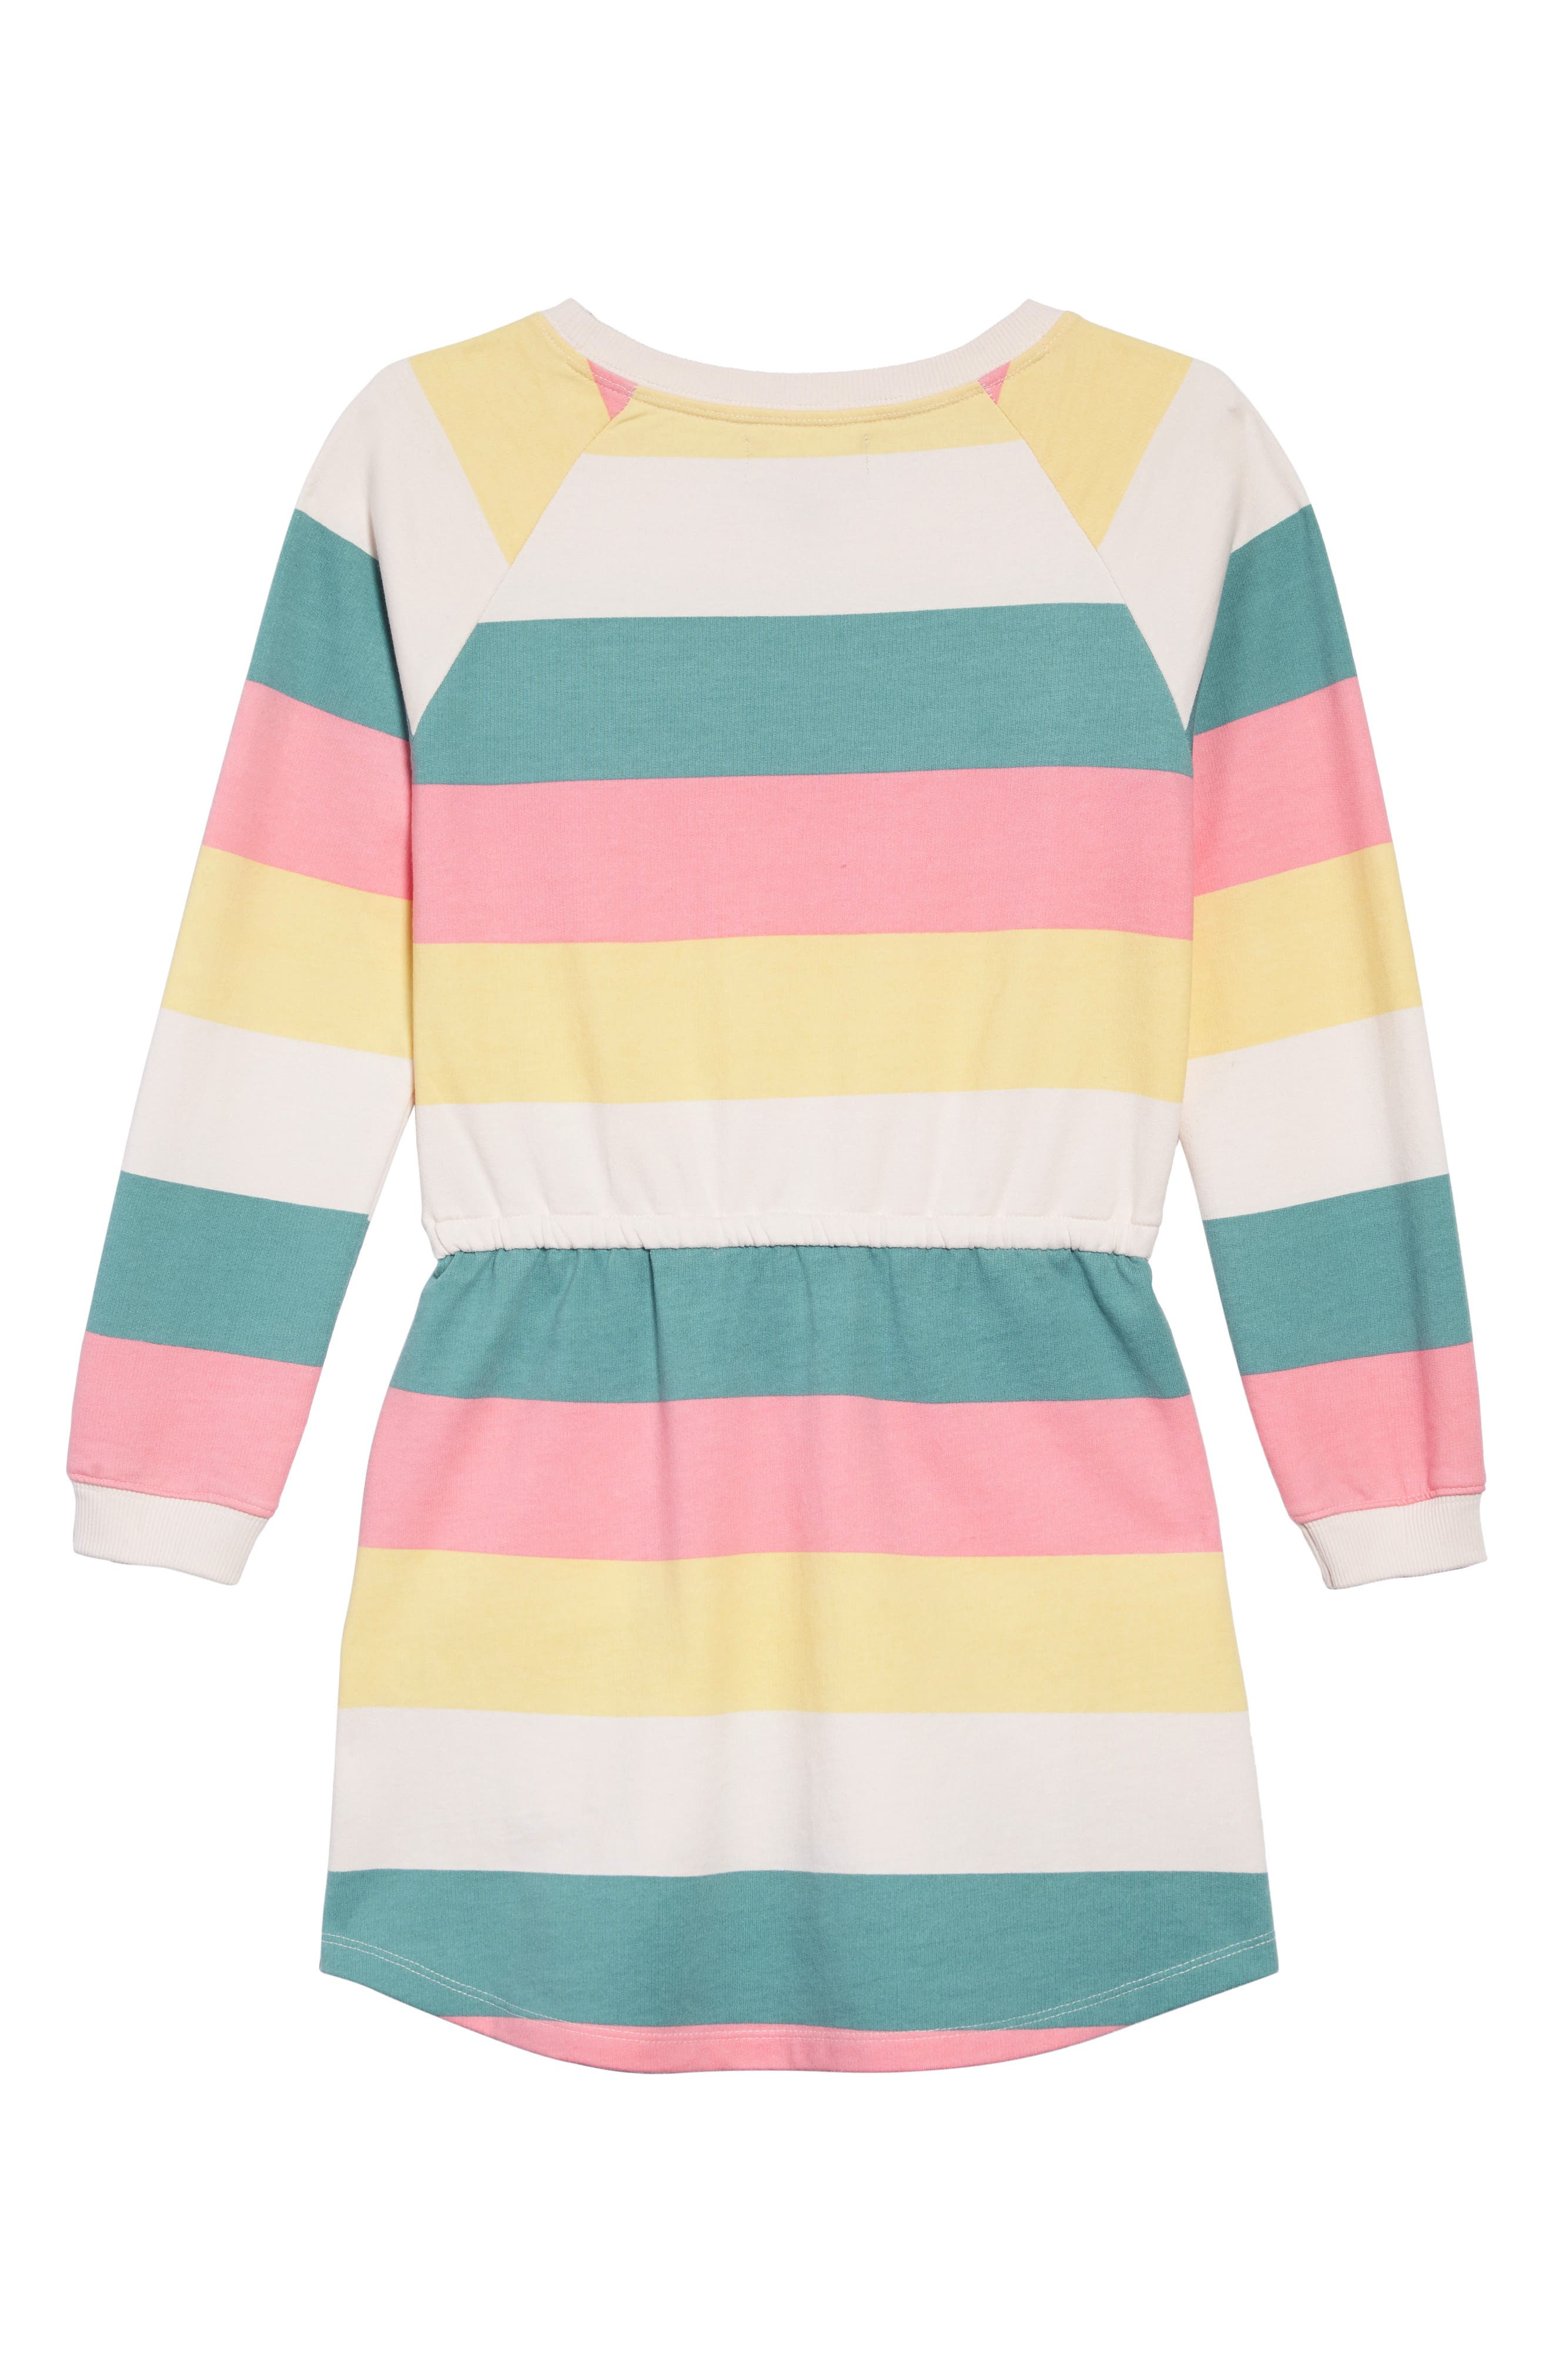 PEEK AREN'T YOU CURIOUS, Brynn Stripe Sweatshirt Dress, Alternate thumbnail 2, color, 650